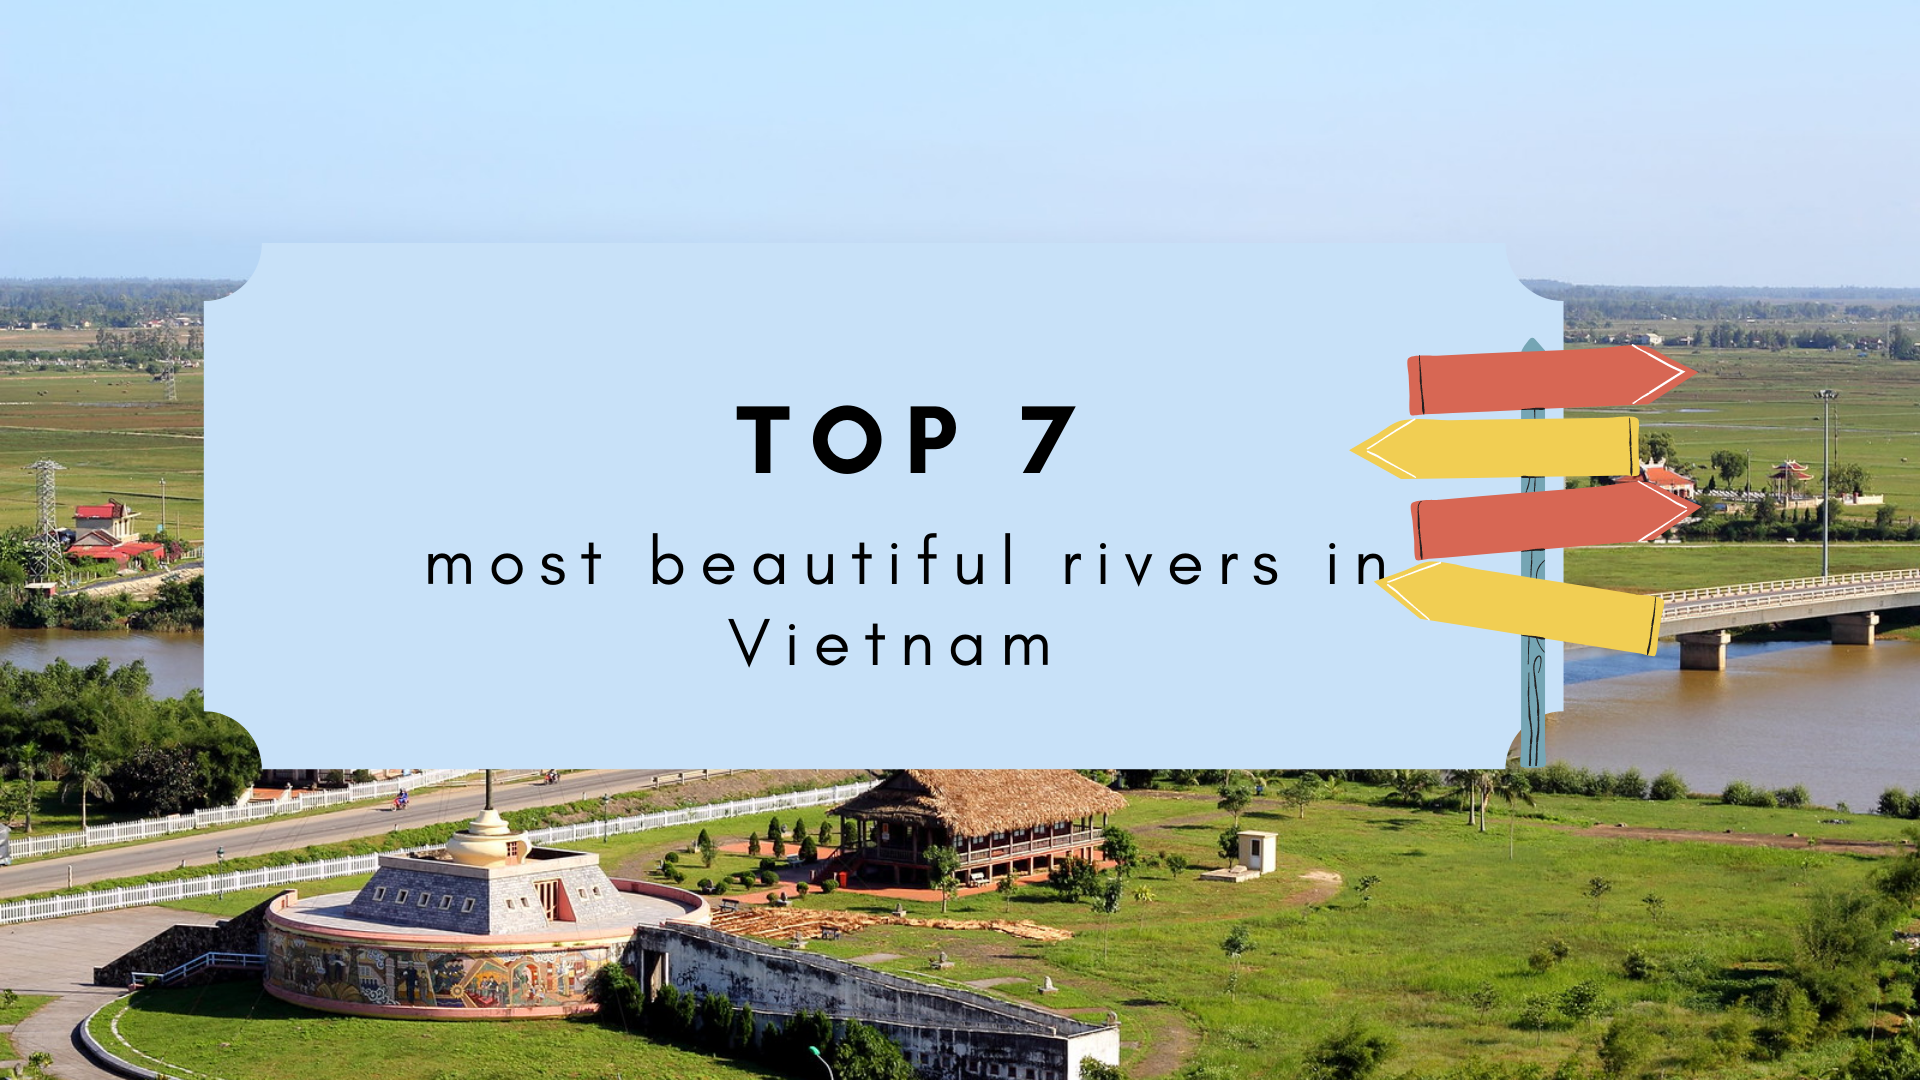 Top 7 Most Beautiful Rivers in Vietnam